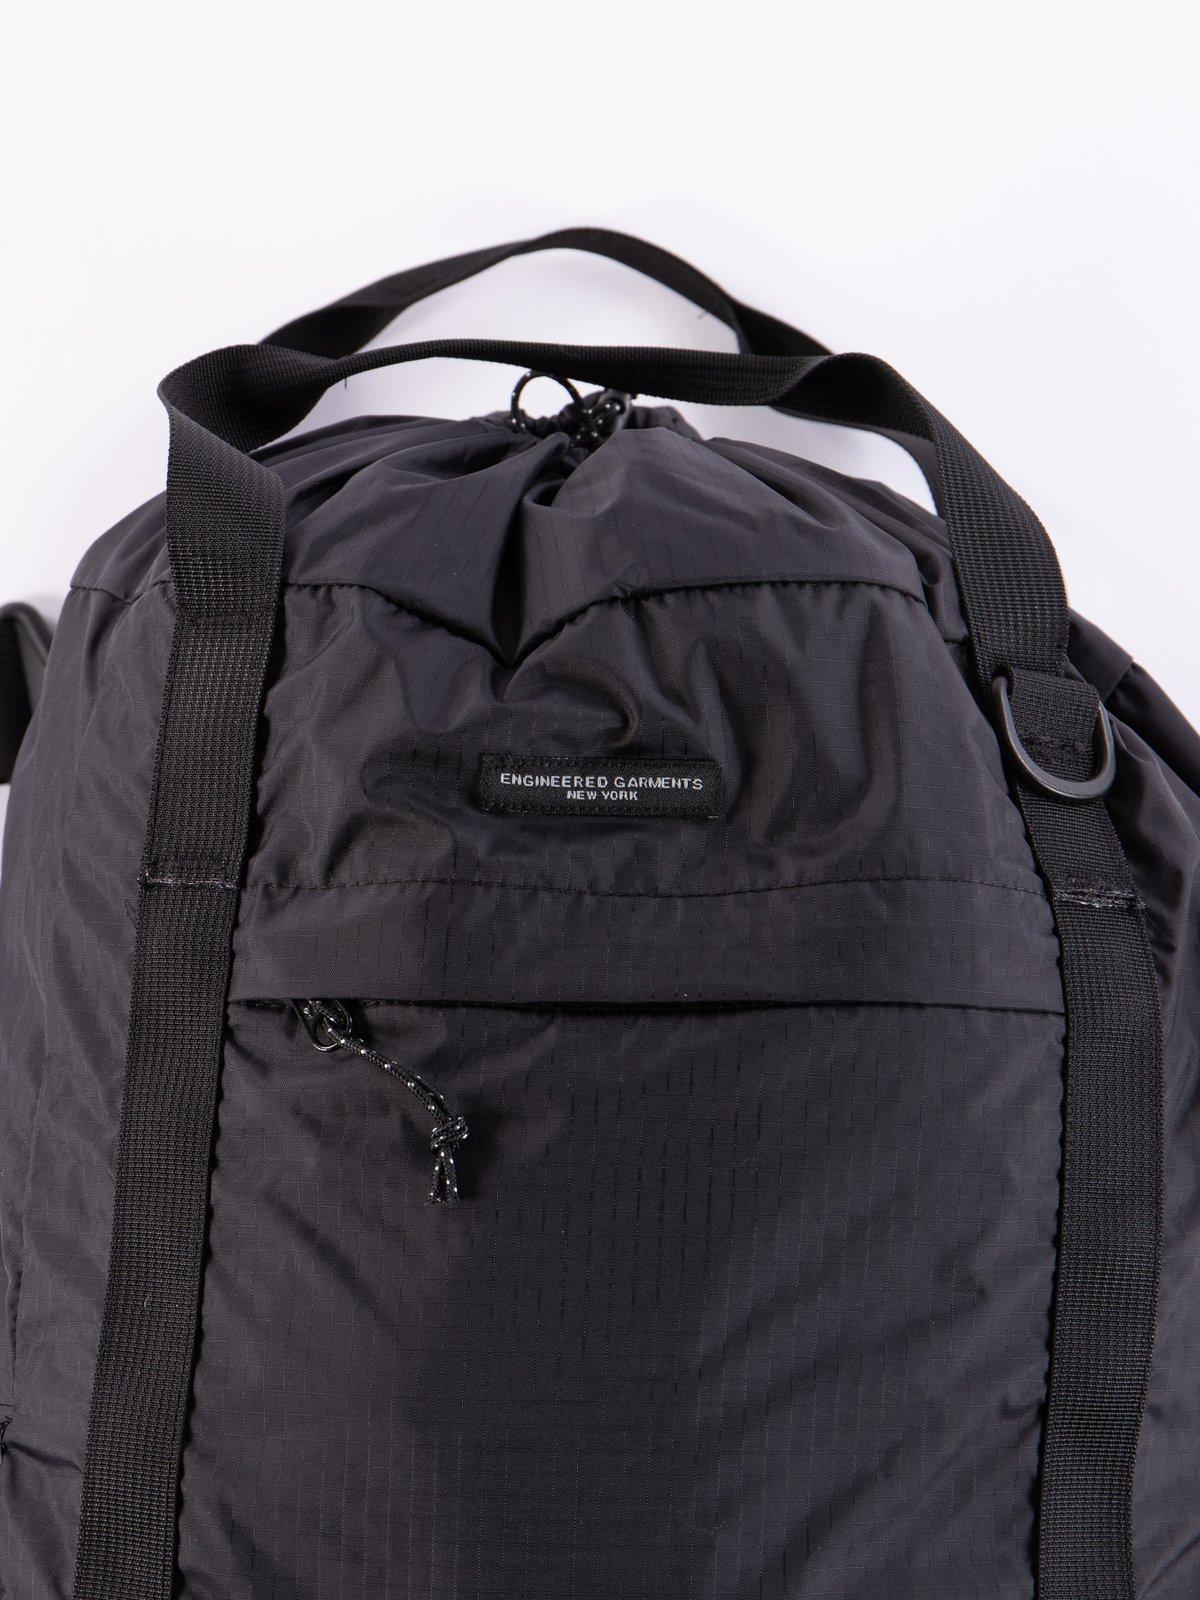 Black Nylon Ripstop UL 3 Way Bag - Image 2